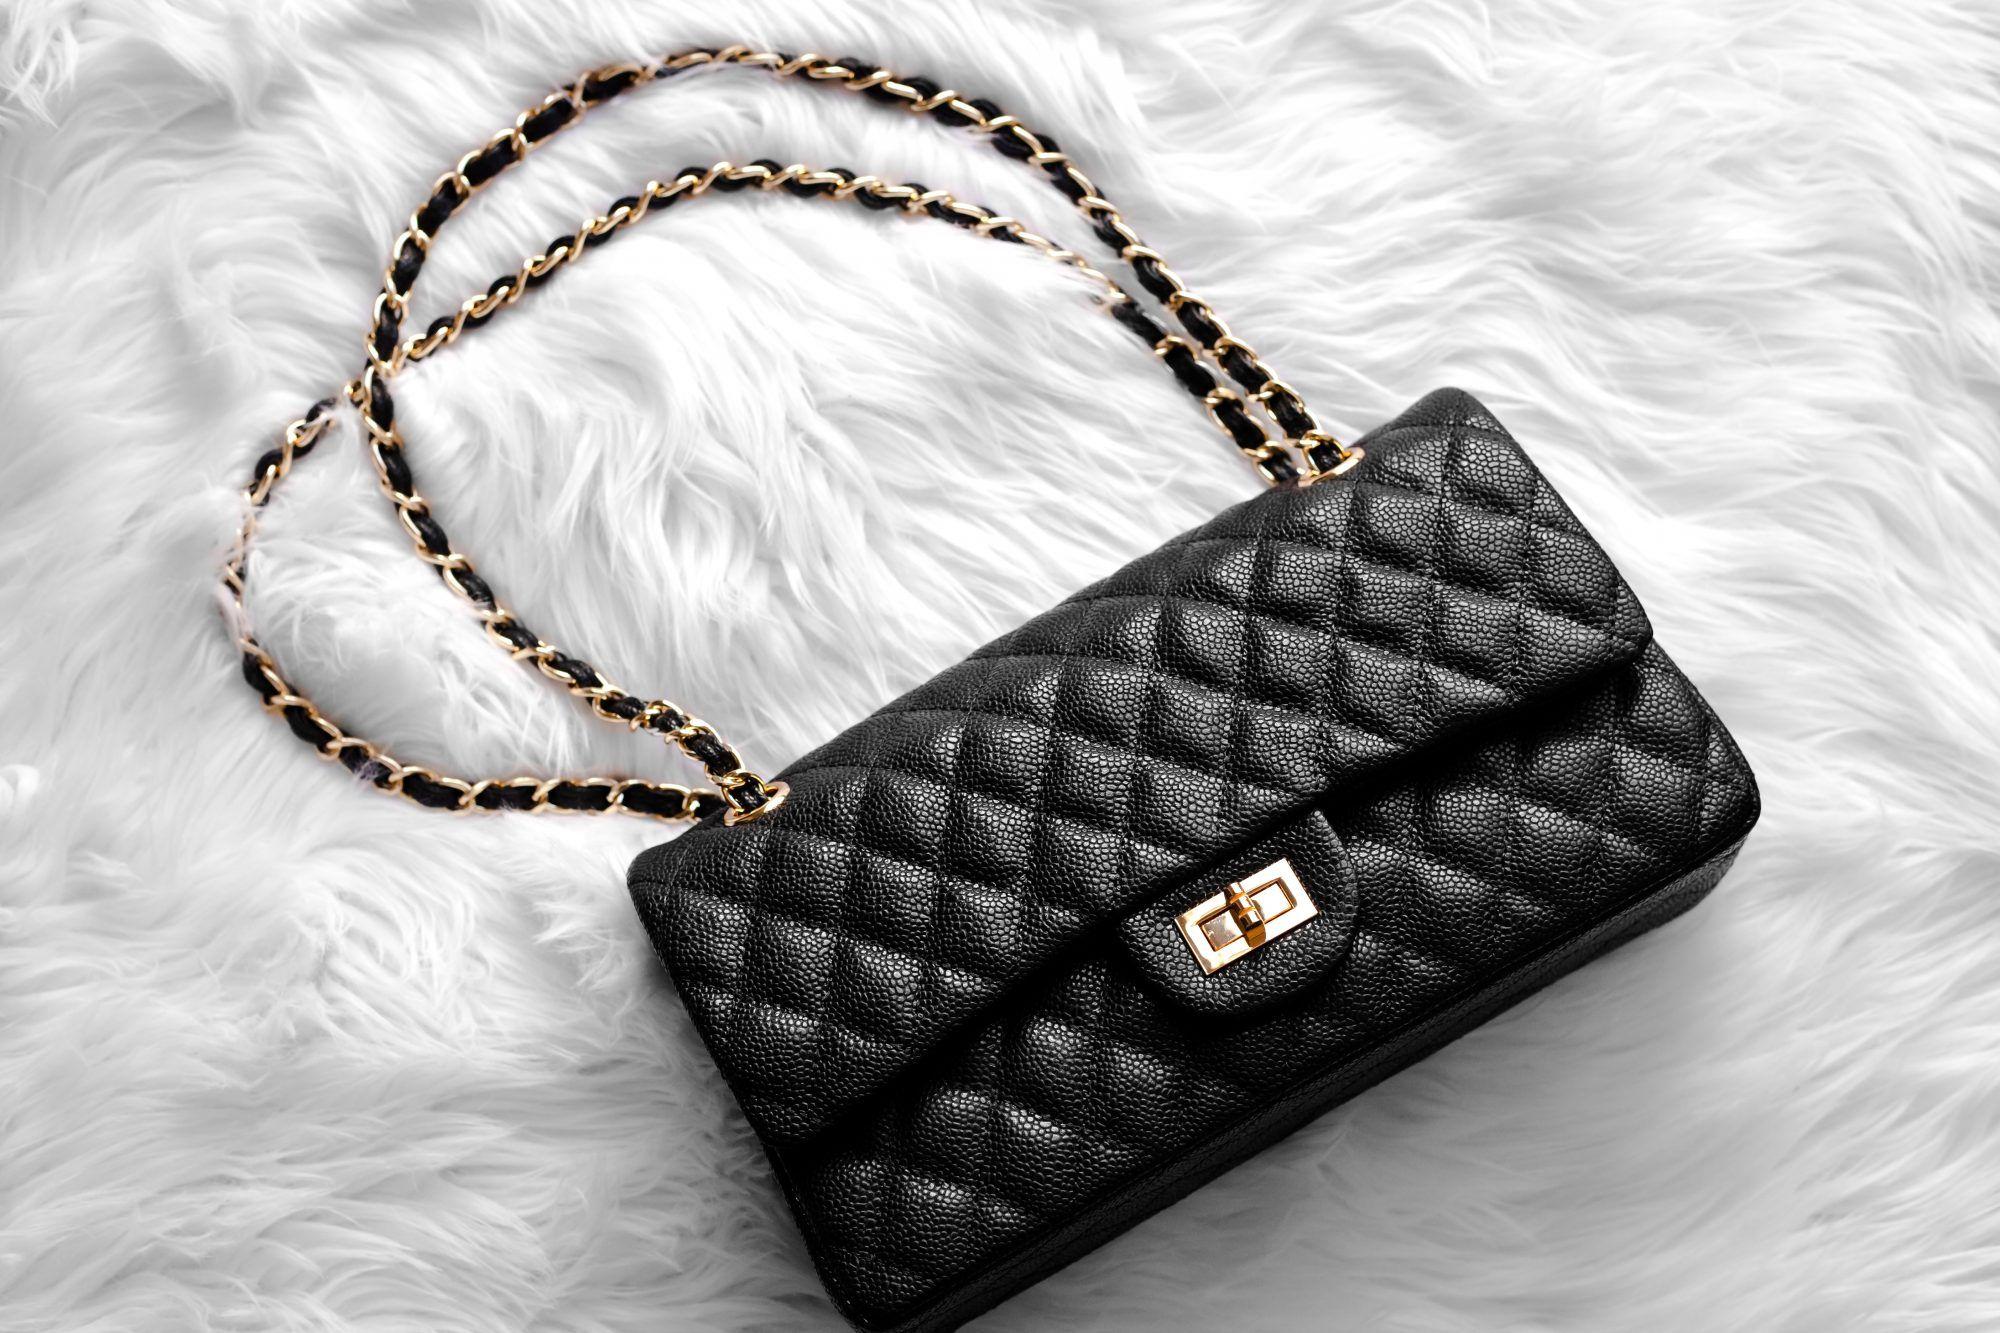 Chanel Medium Classic Flap Bag